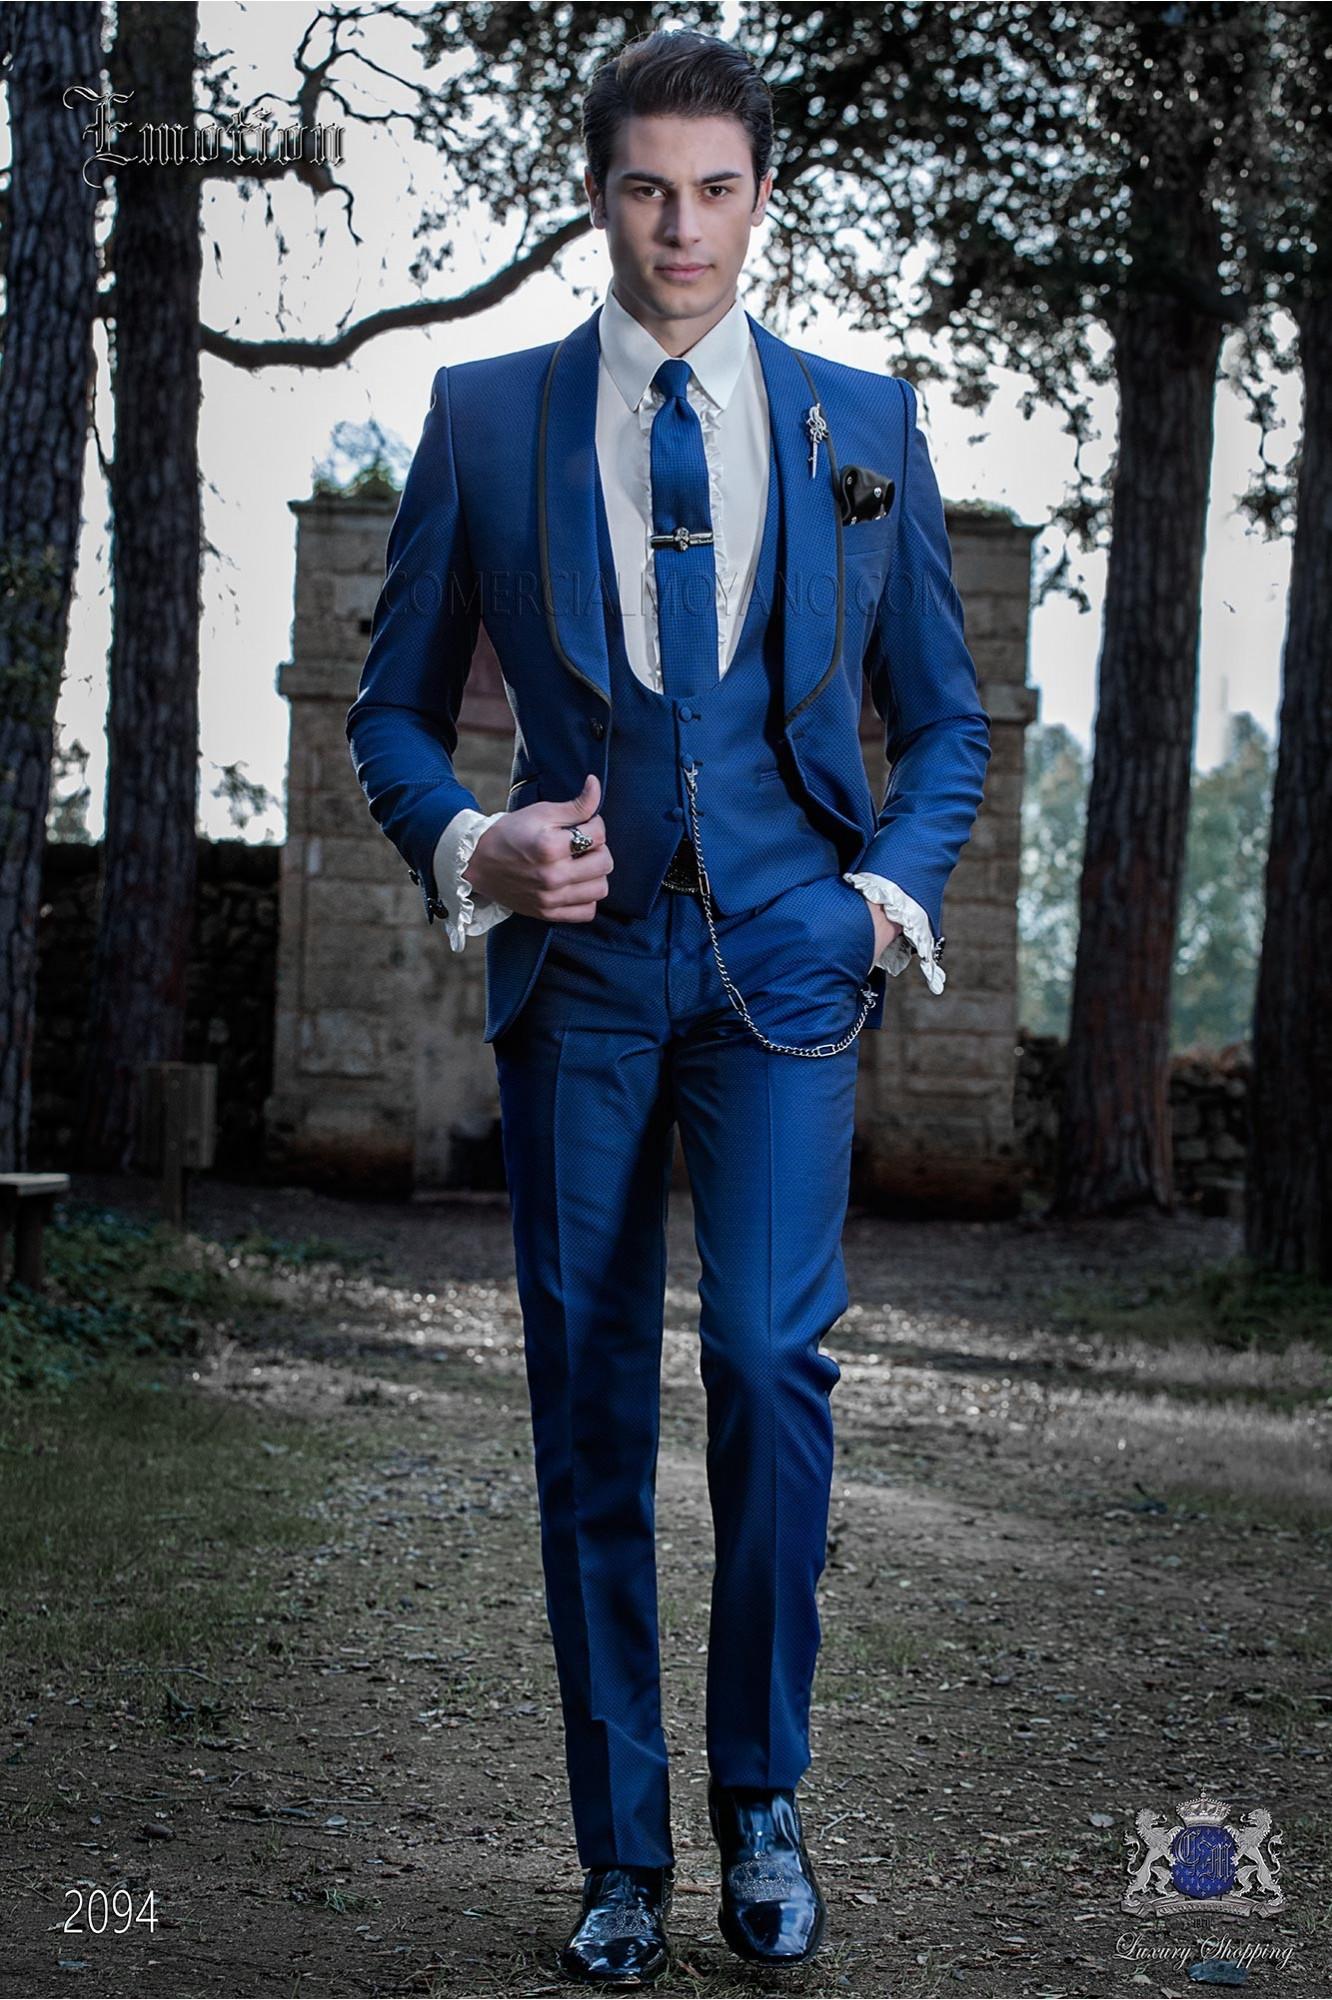 Italian fashion tuxedo electric blue polka dots microdesign. Wool mix fabric